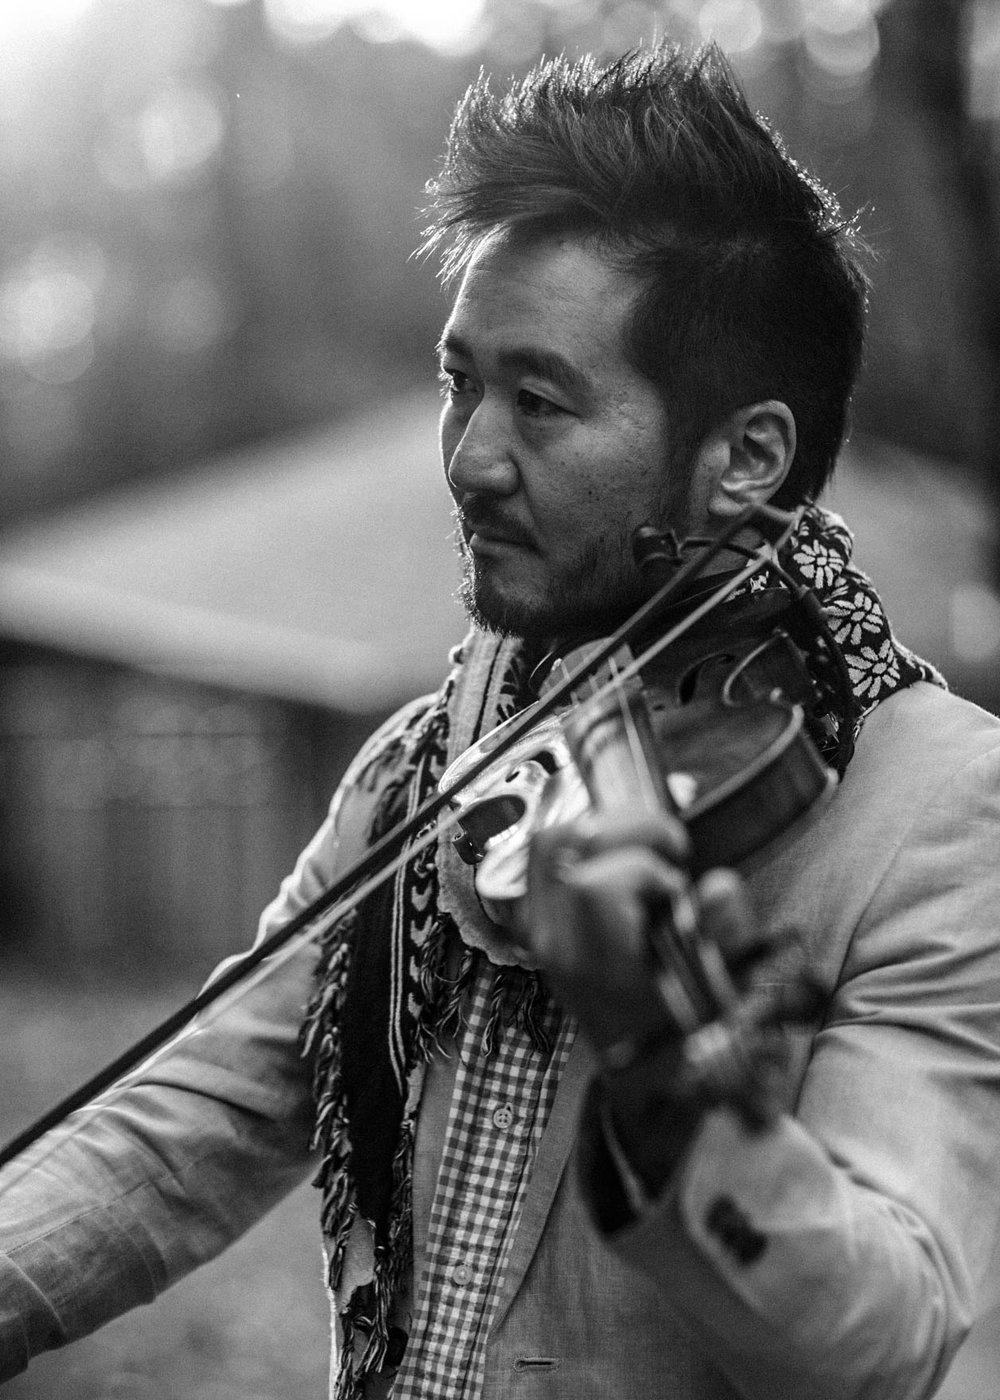 KISHI BASHI - Composer/Director